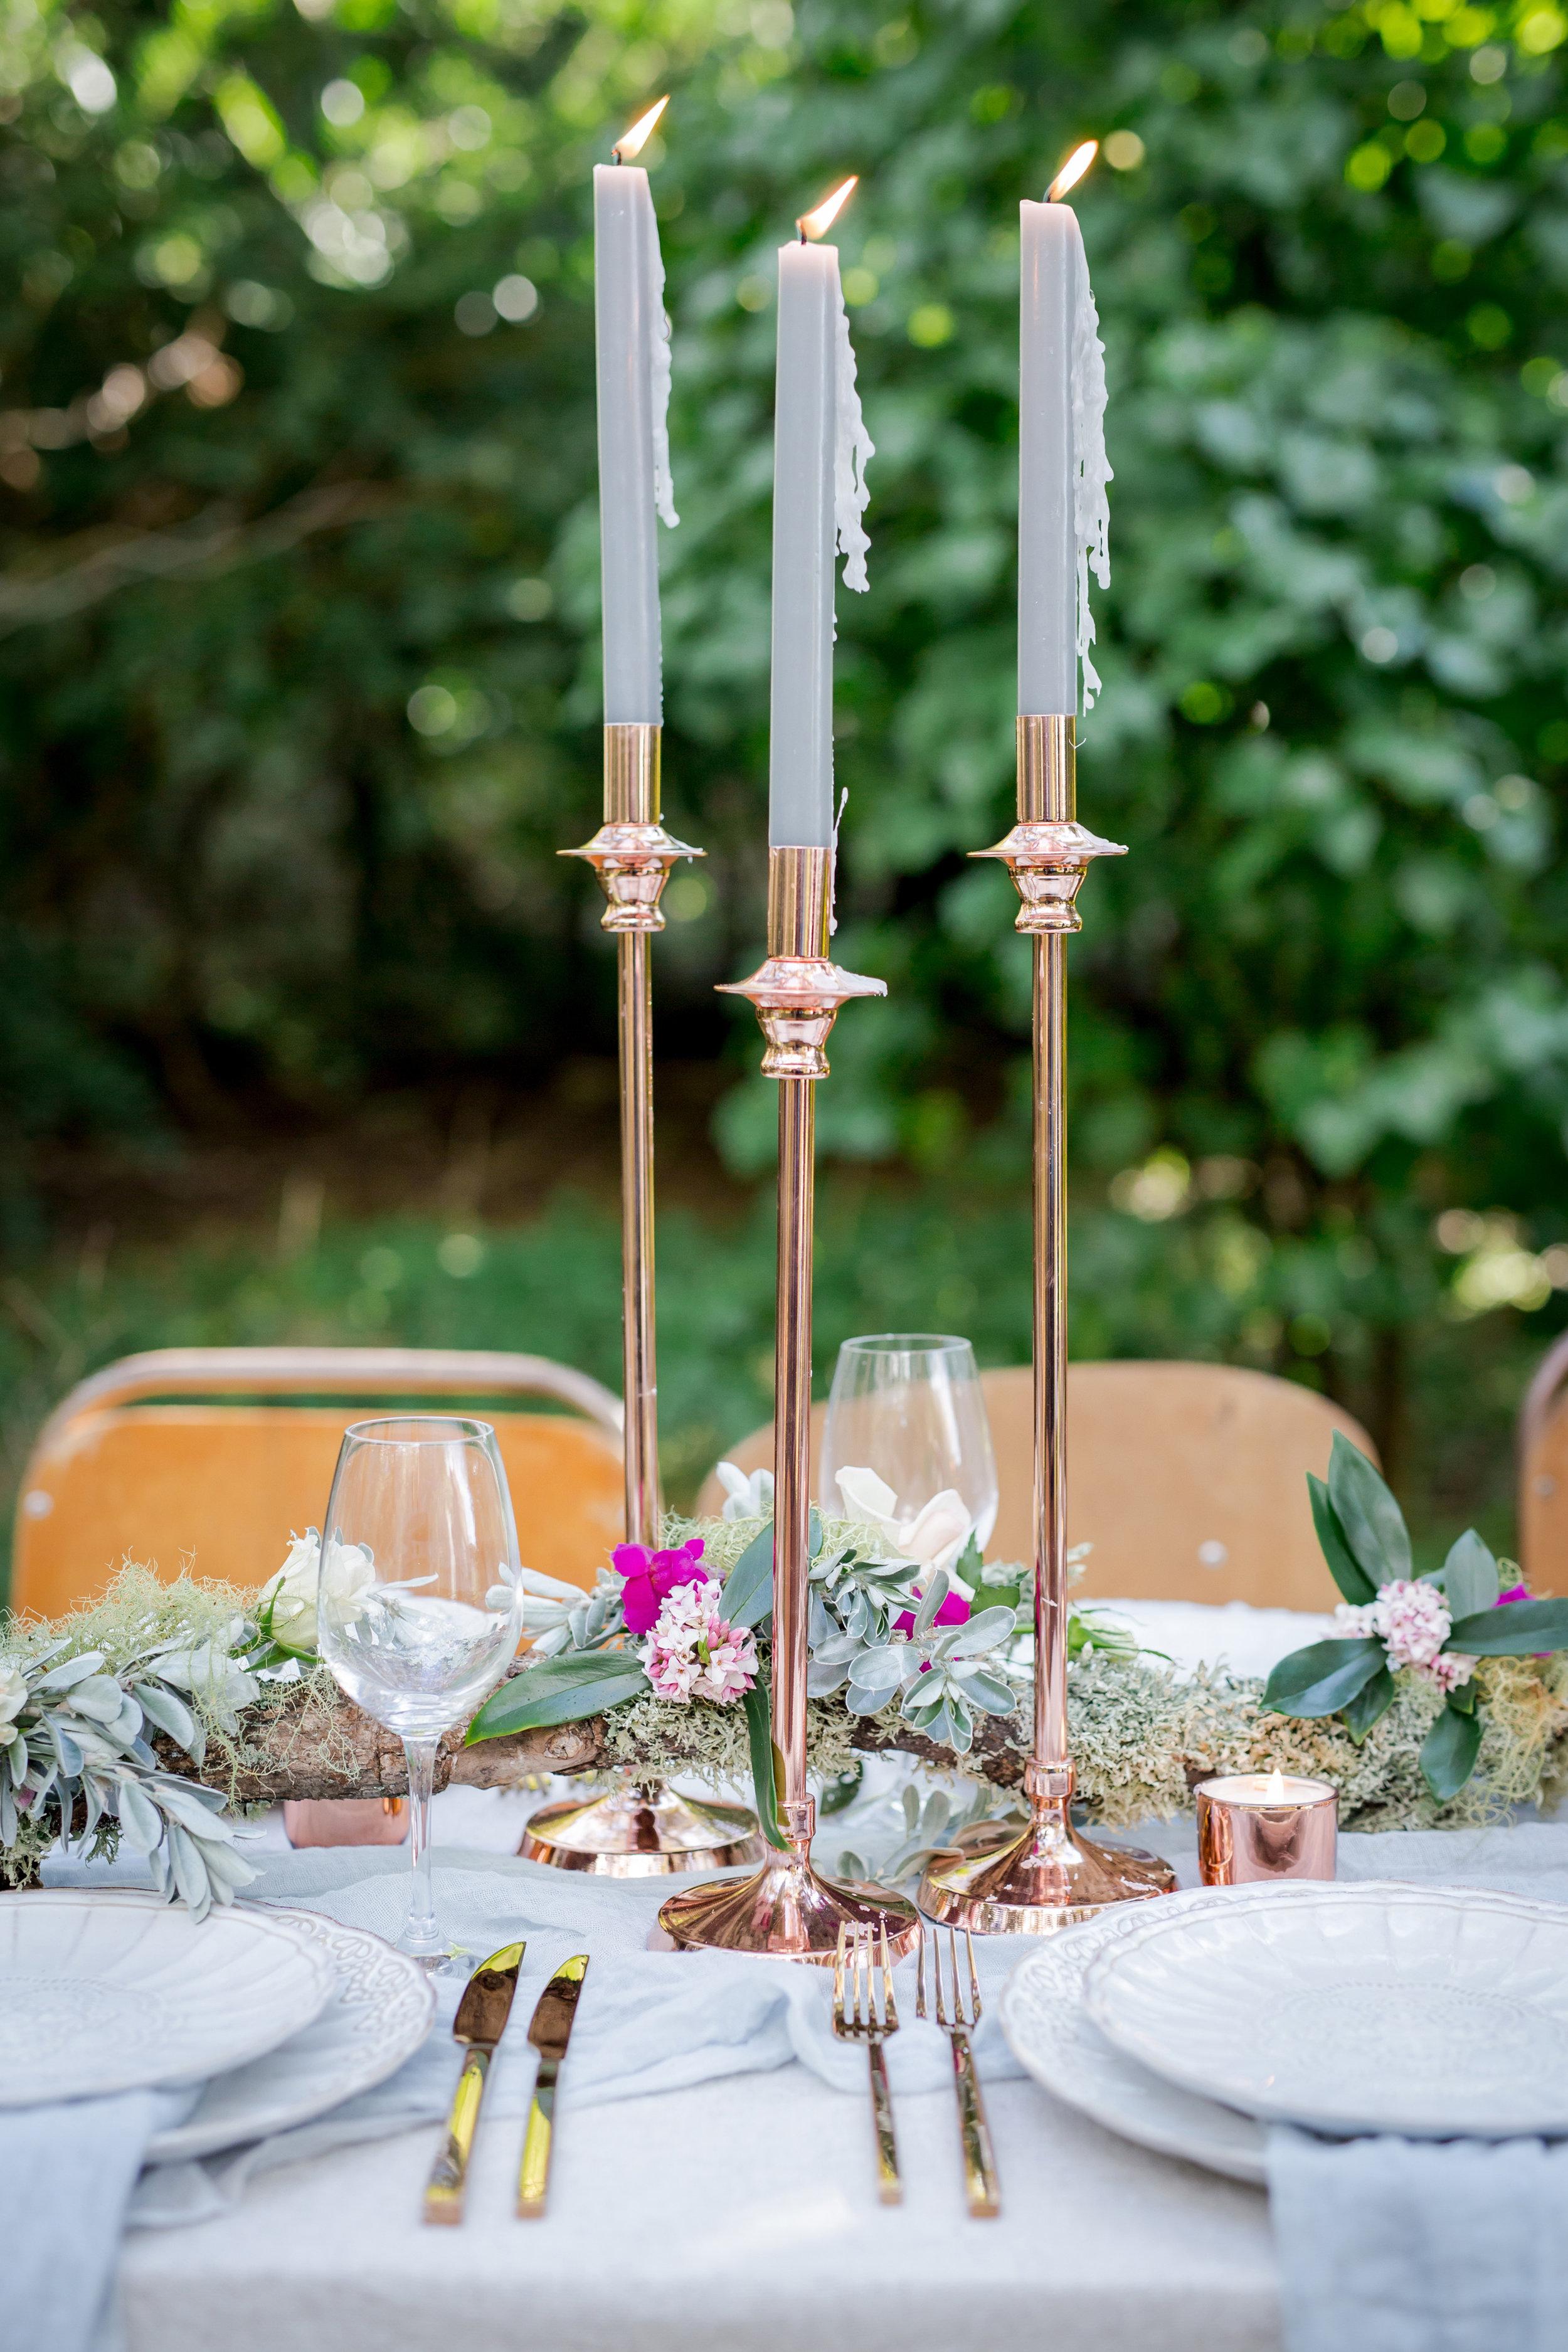 Rose Gold/Copper Candle Sticks